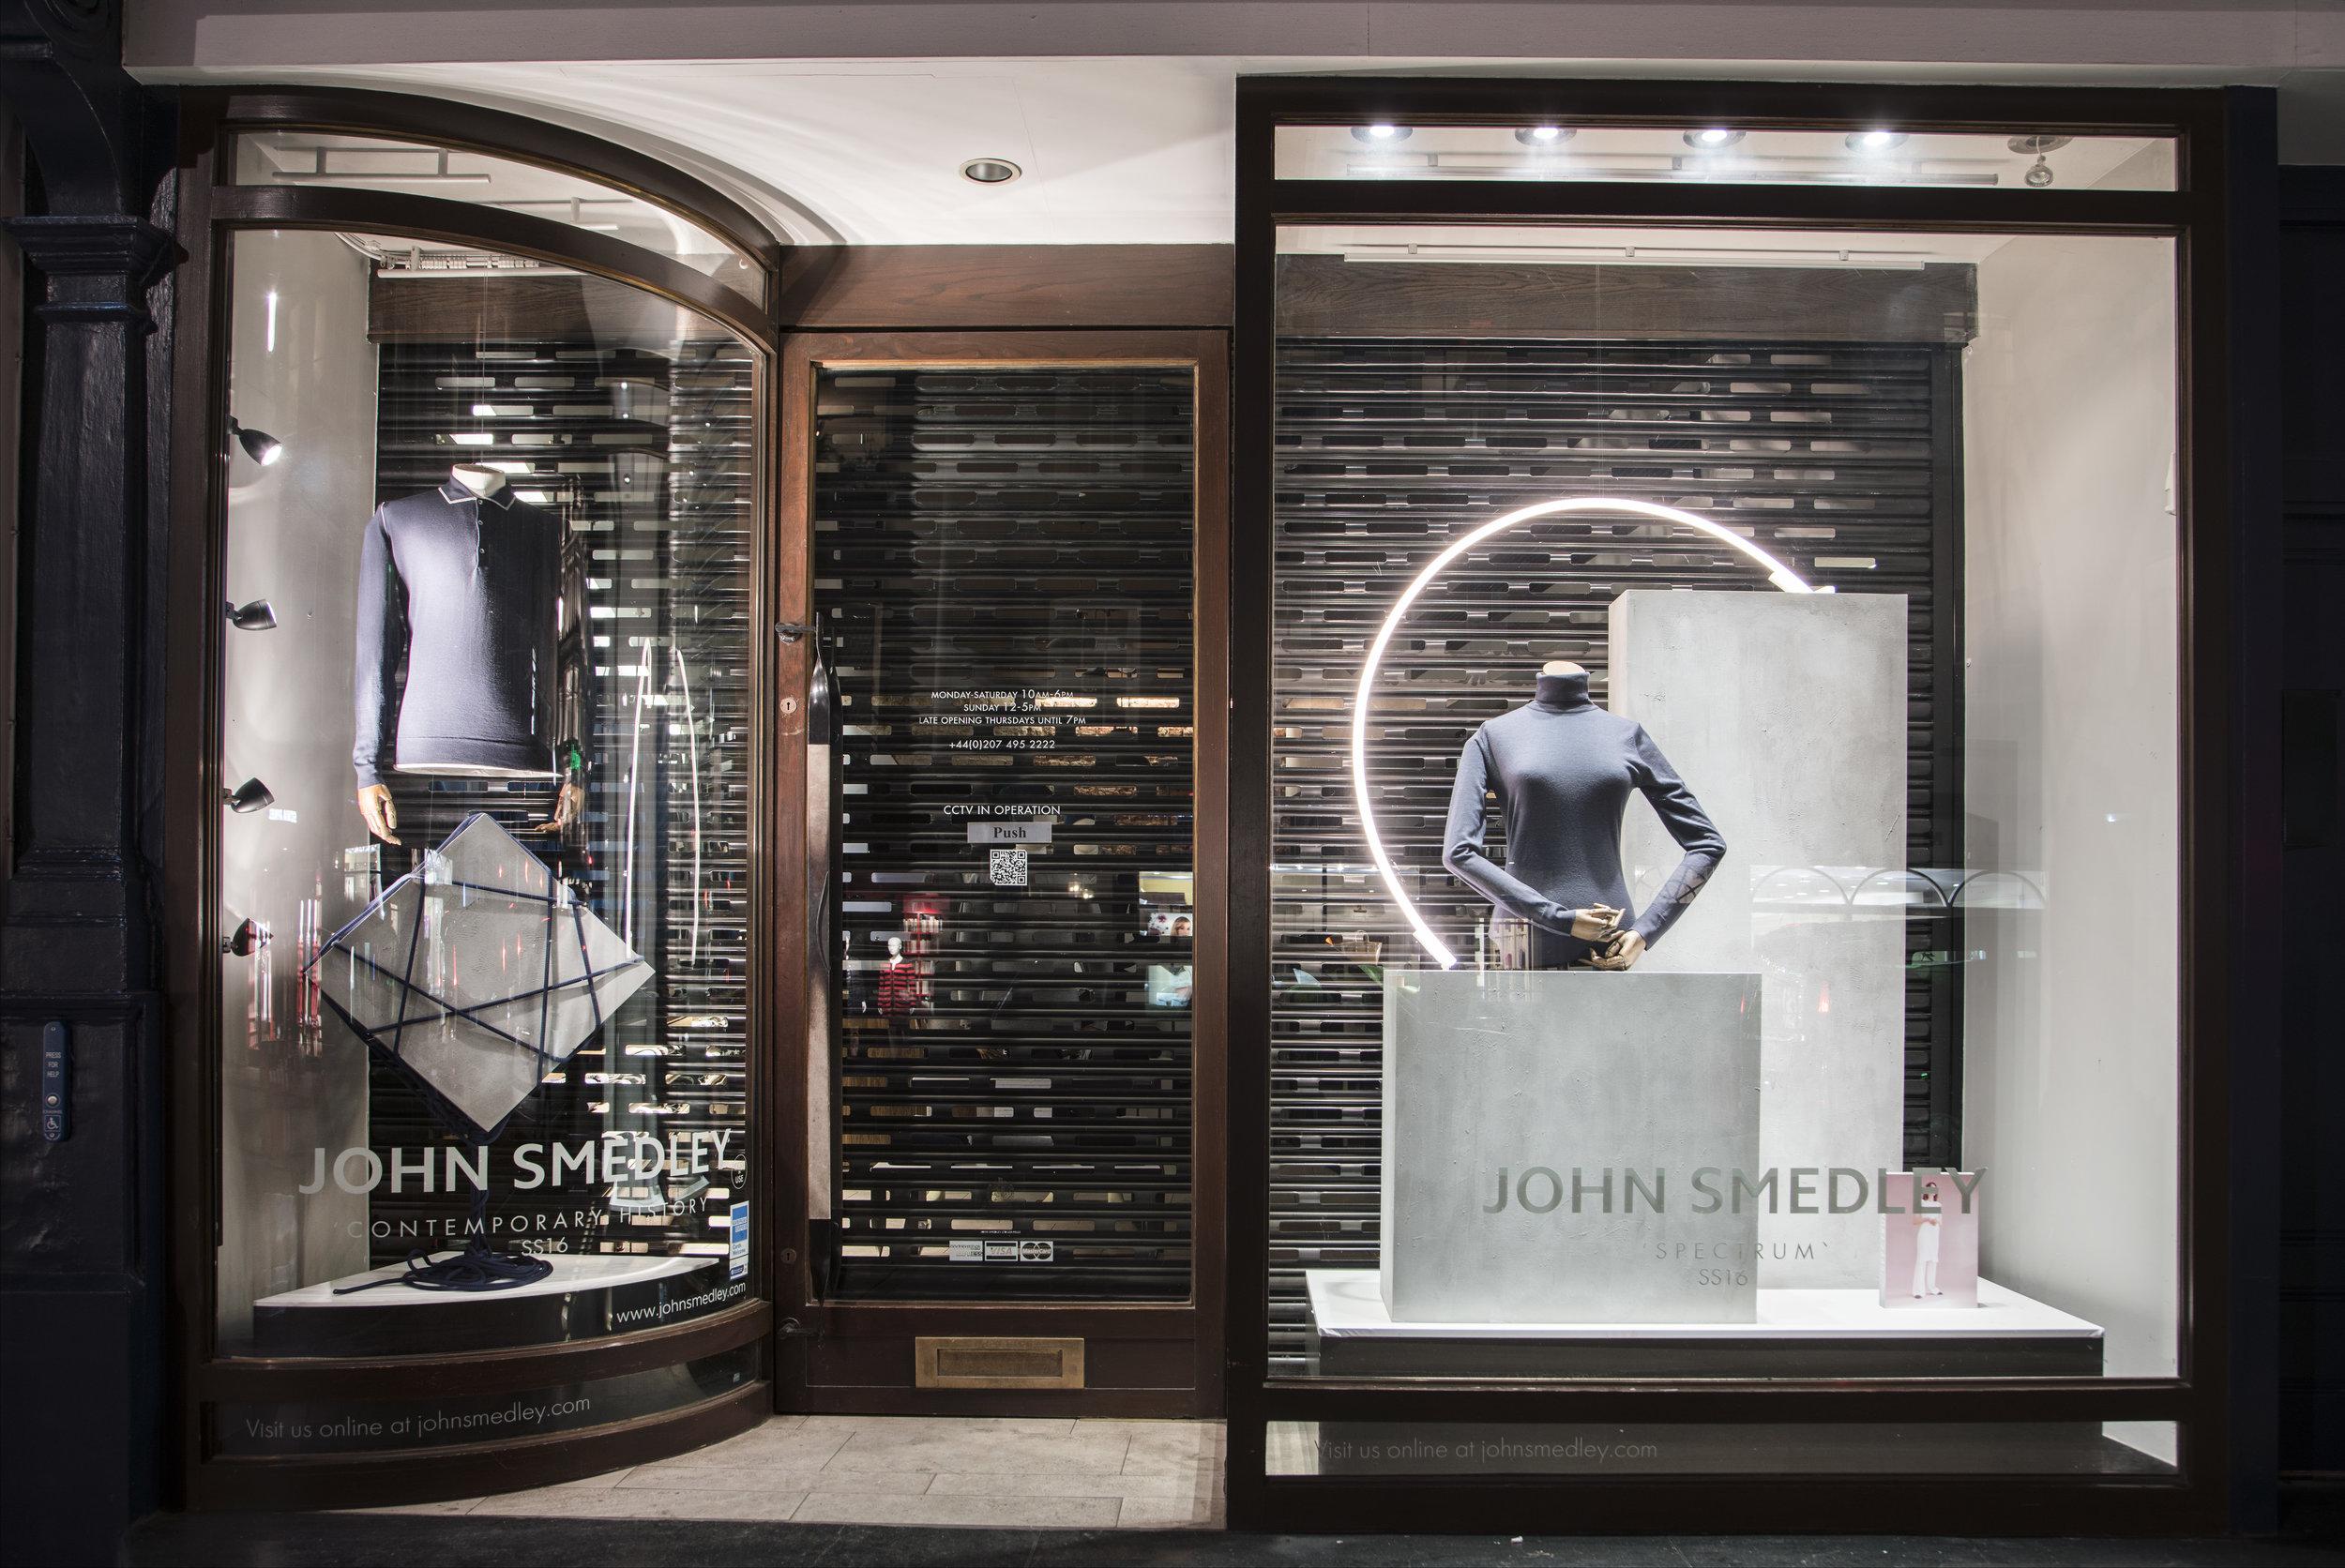 onebigcompany-design-london-art-direction-retail-marketing-window-display-.jpg-concrete-spectrum-ss160-neon.jpg